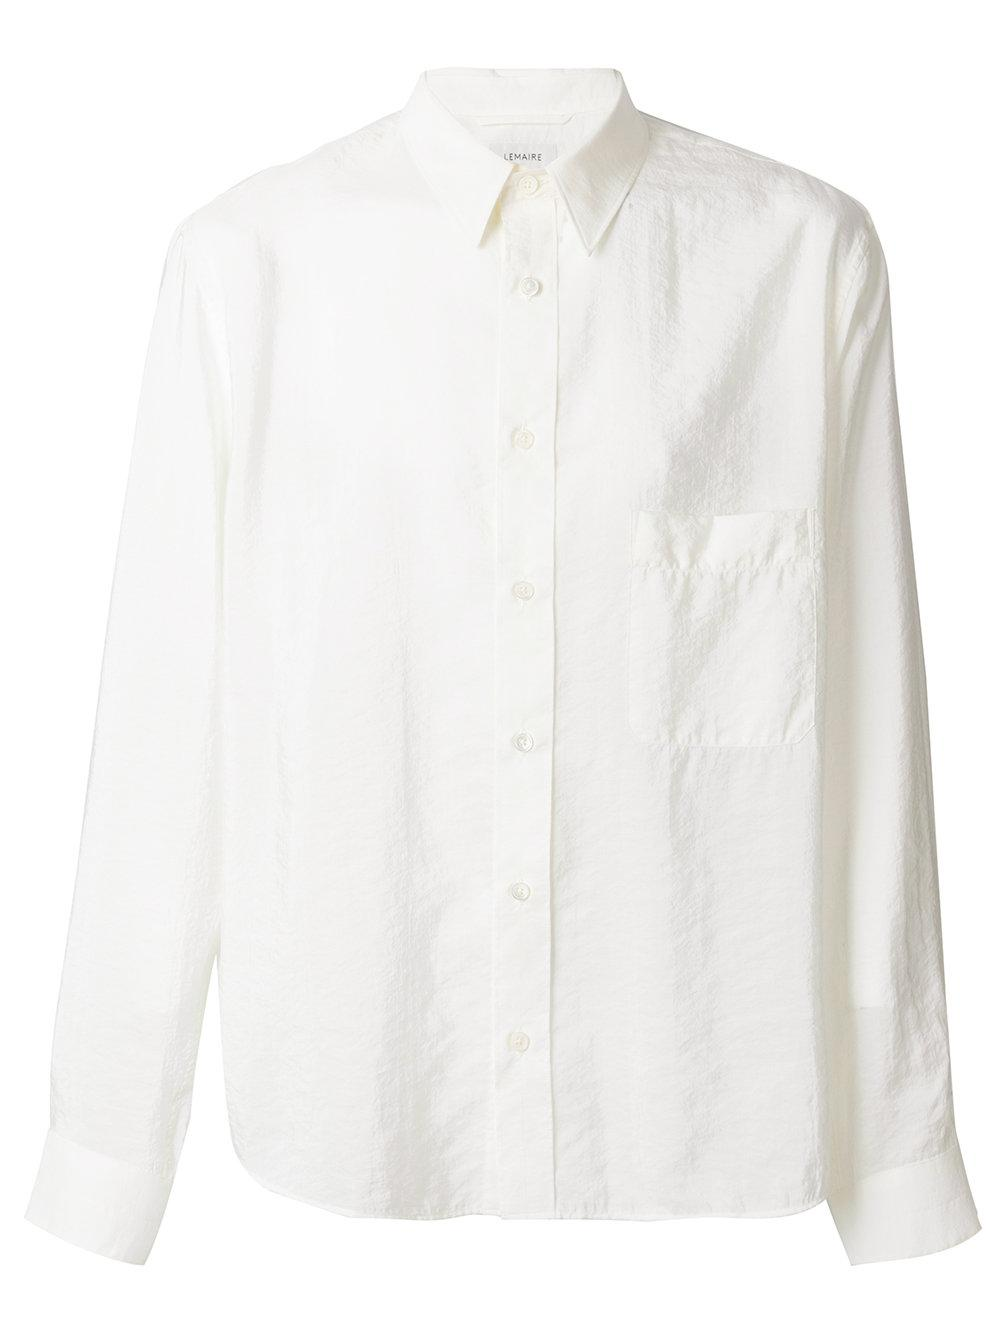 Lemaire Long Sleeve Shirt